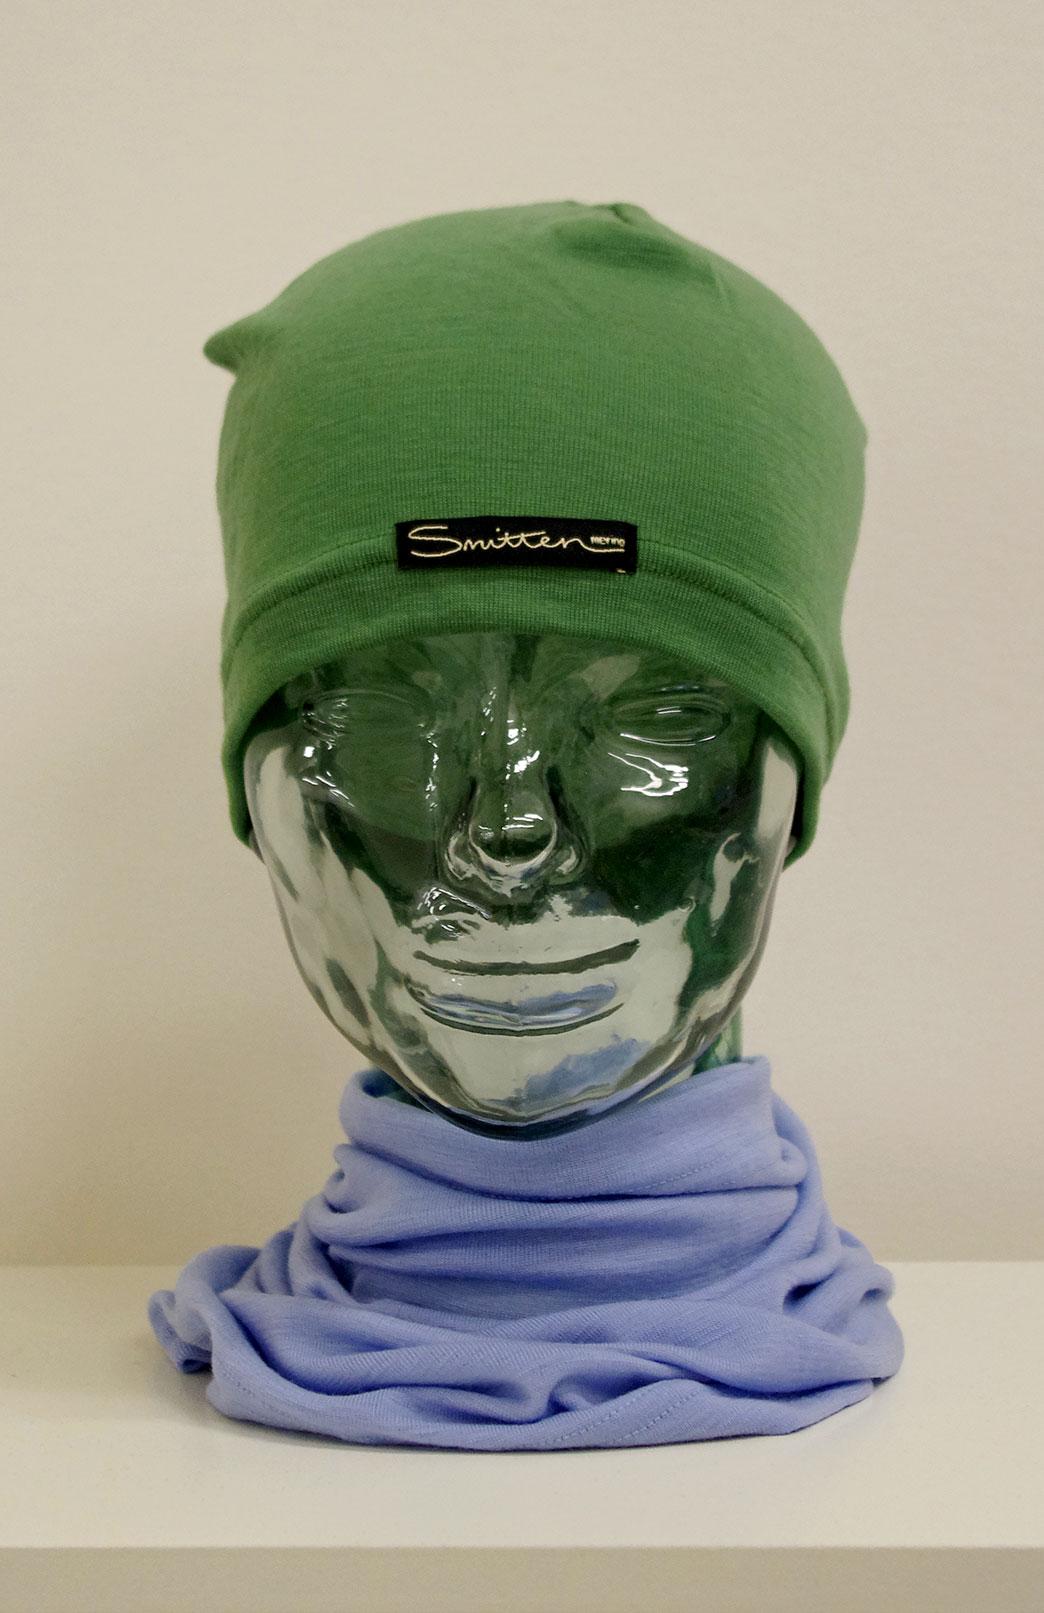 Beanie - Mid-weight Loose Fit Skull Cap - Unisex Green Merino Wool Loose Fit Beanie Skull Cap - Smitten Merino Tasmania Australia